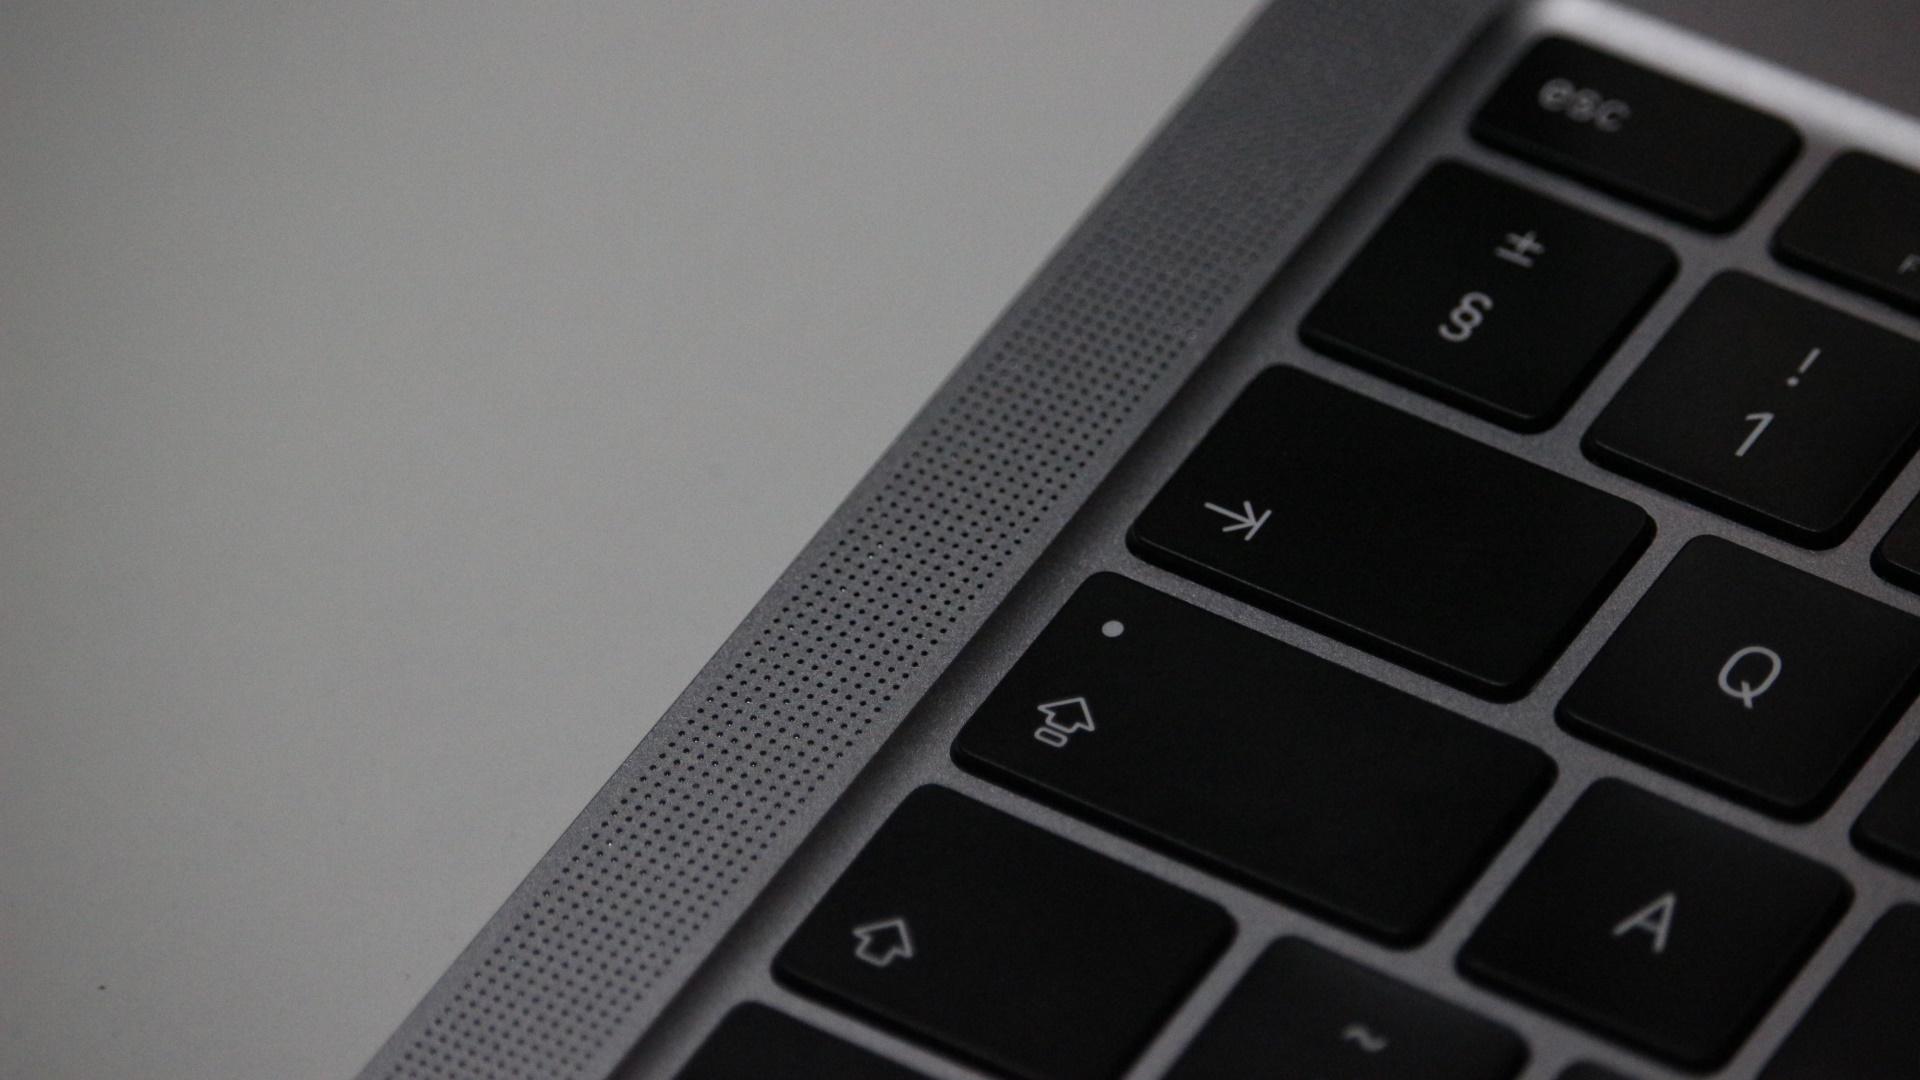 Apple MacBook Air M1 left speaker grill